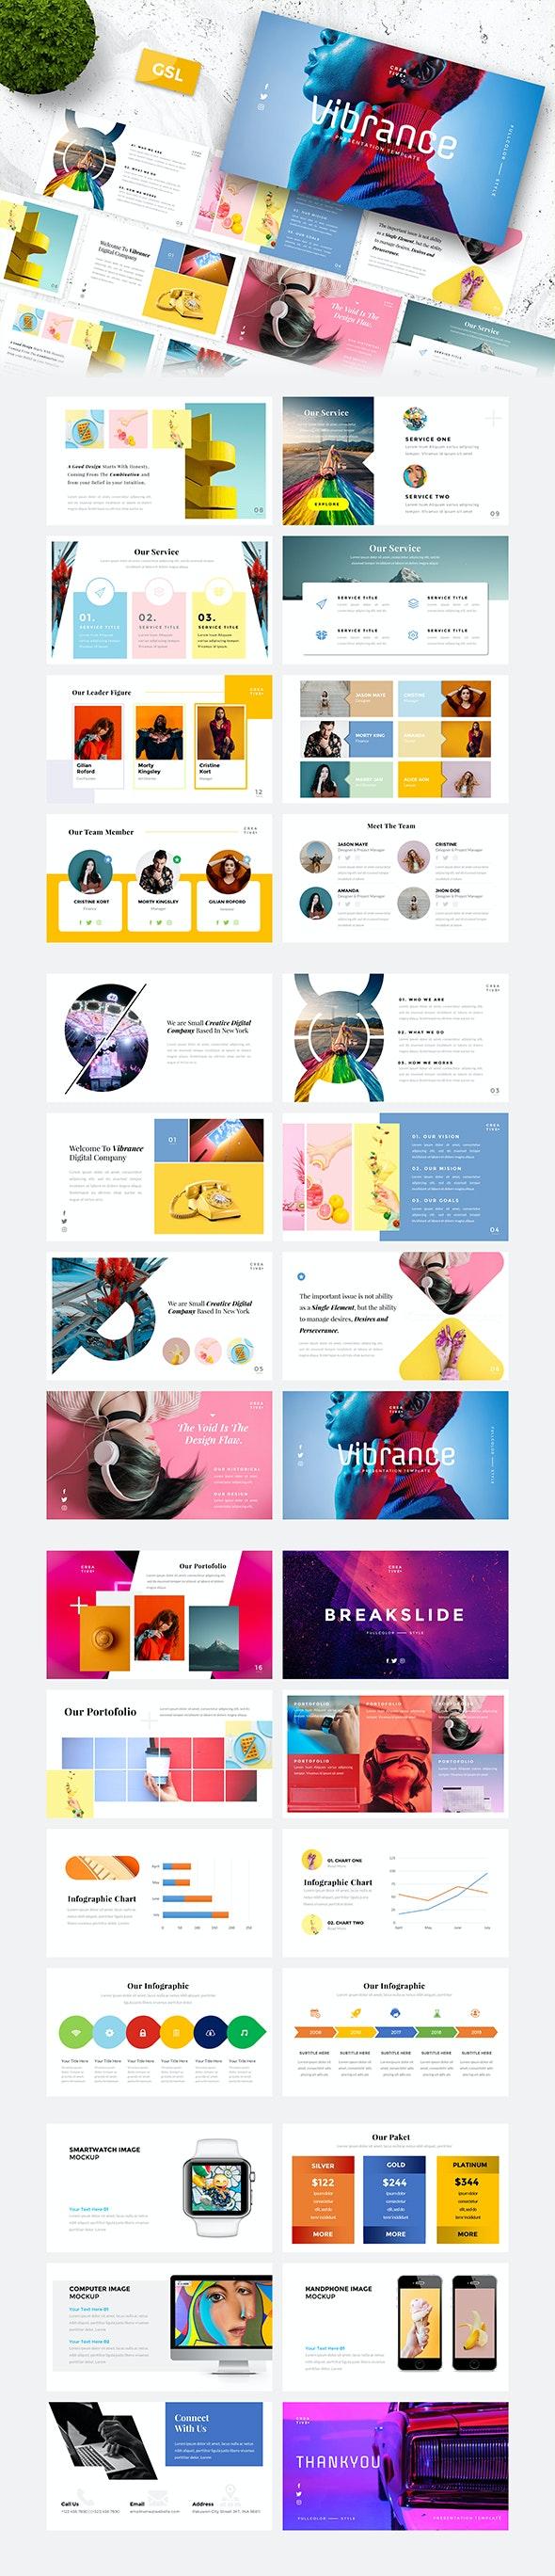 Vibrance – Creative Google Slides Template - Google Slides Presentation Templates